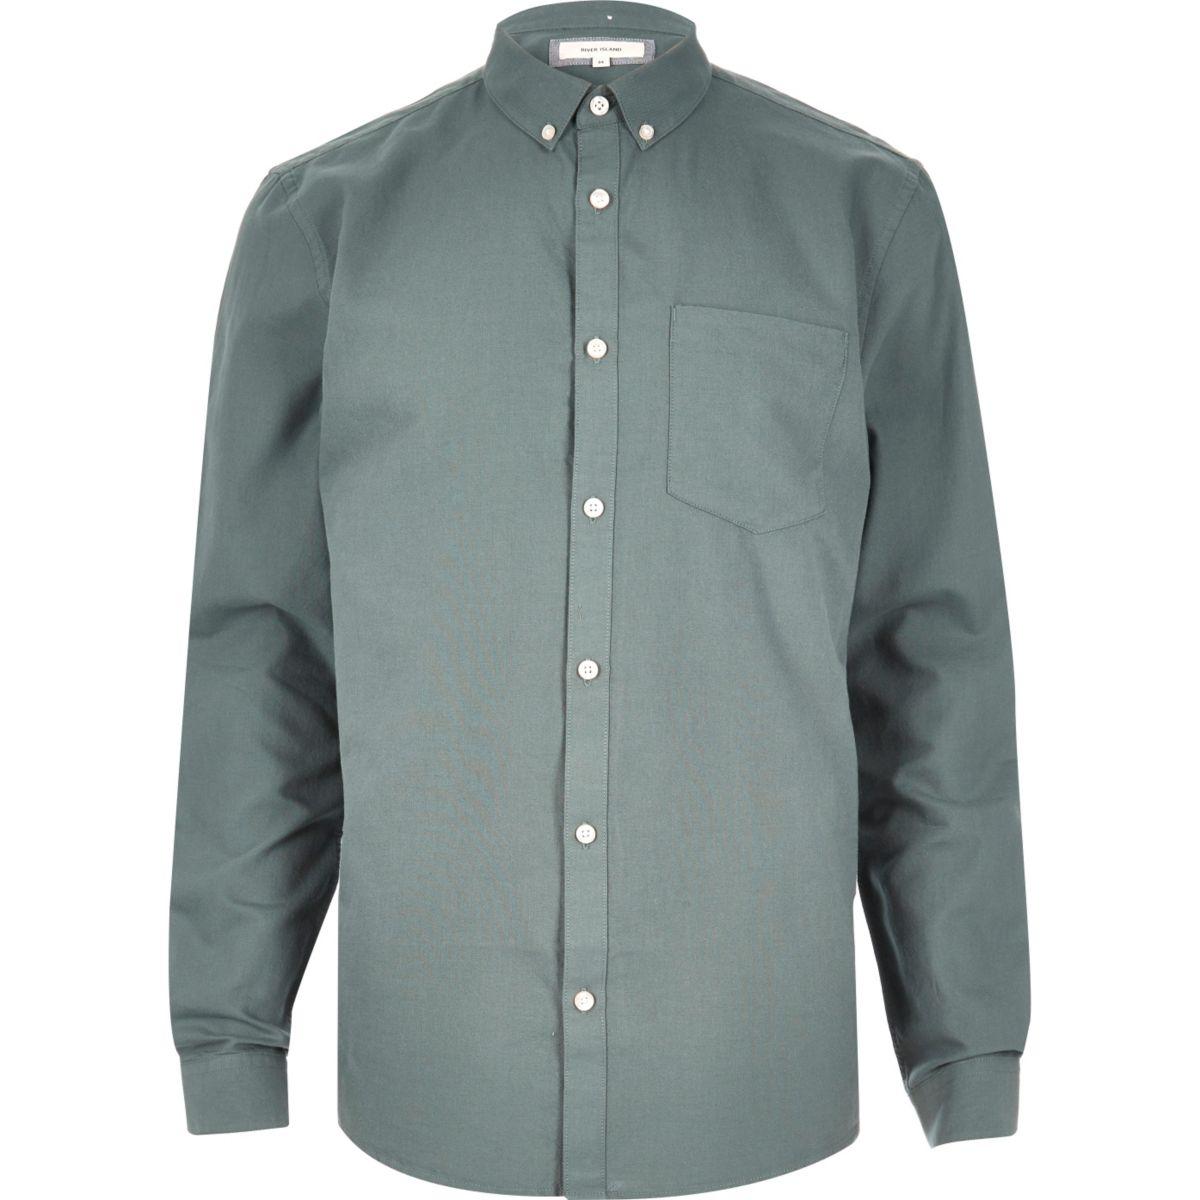 Green Oxford shirt